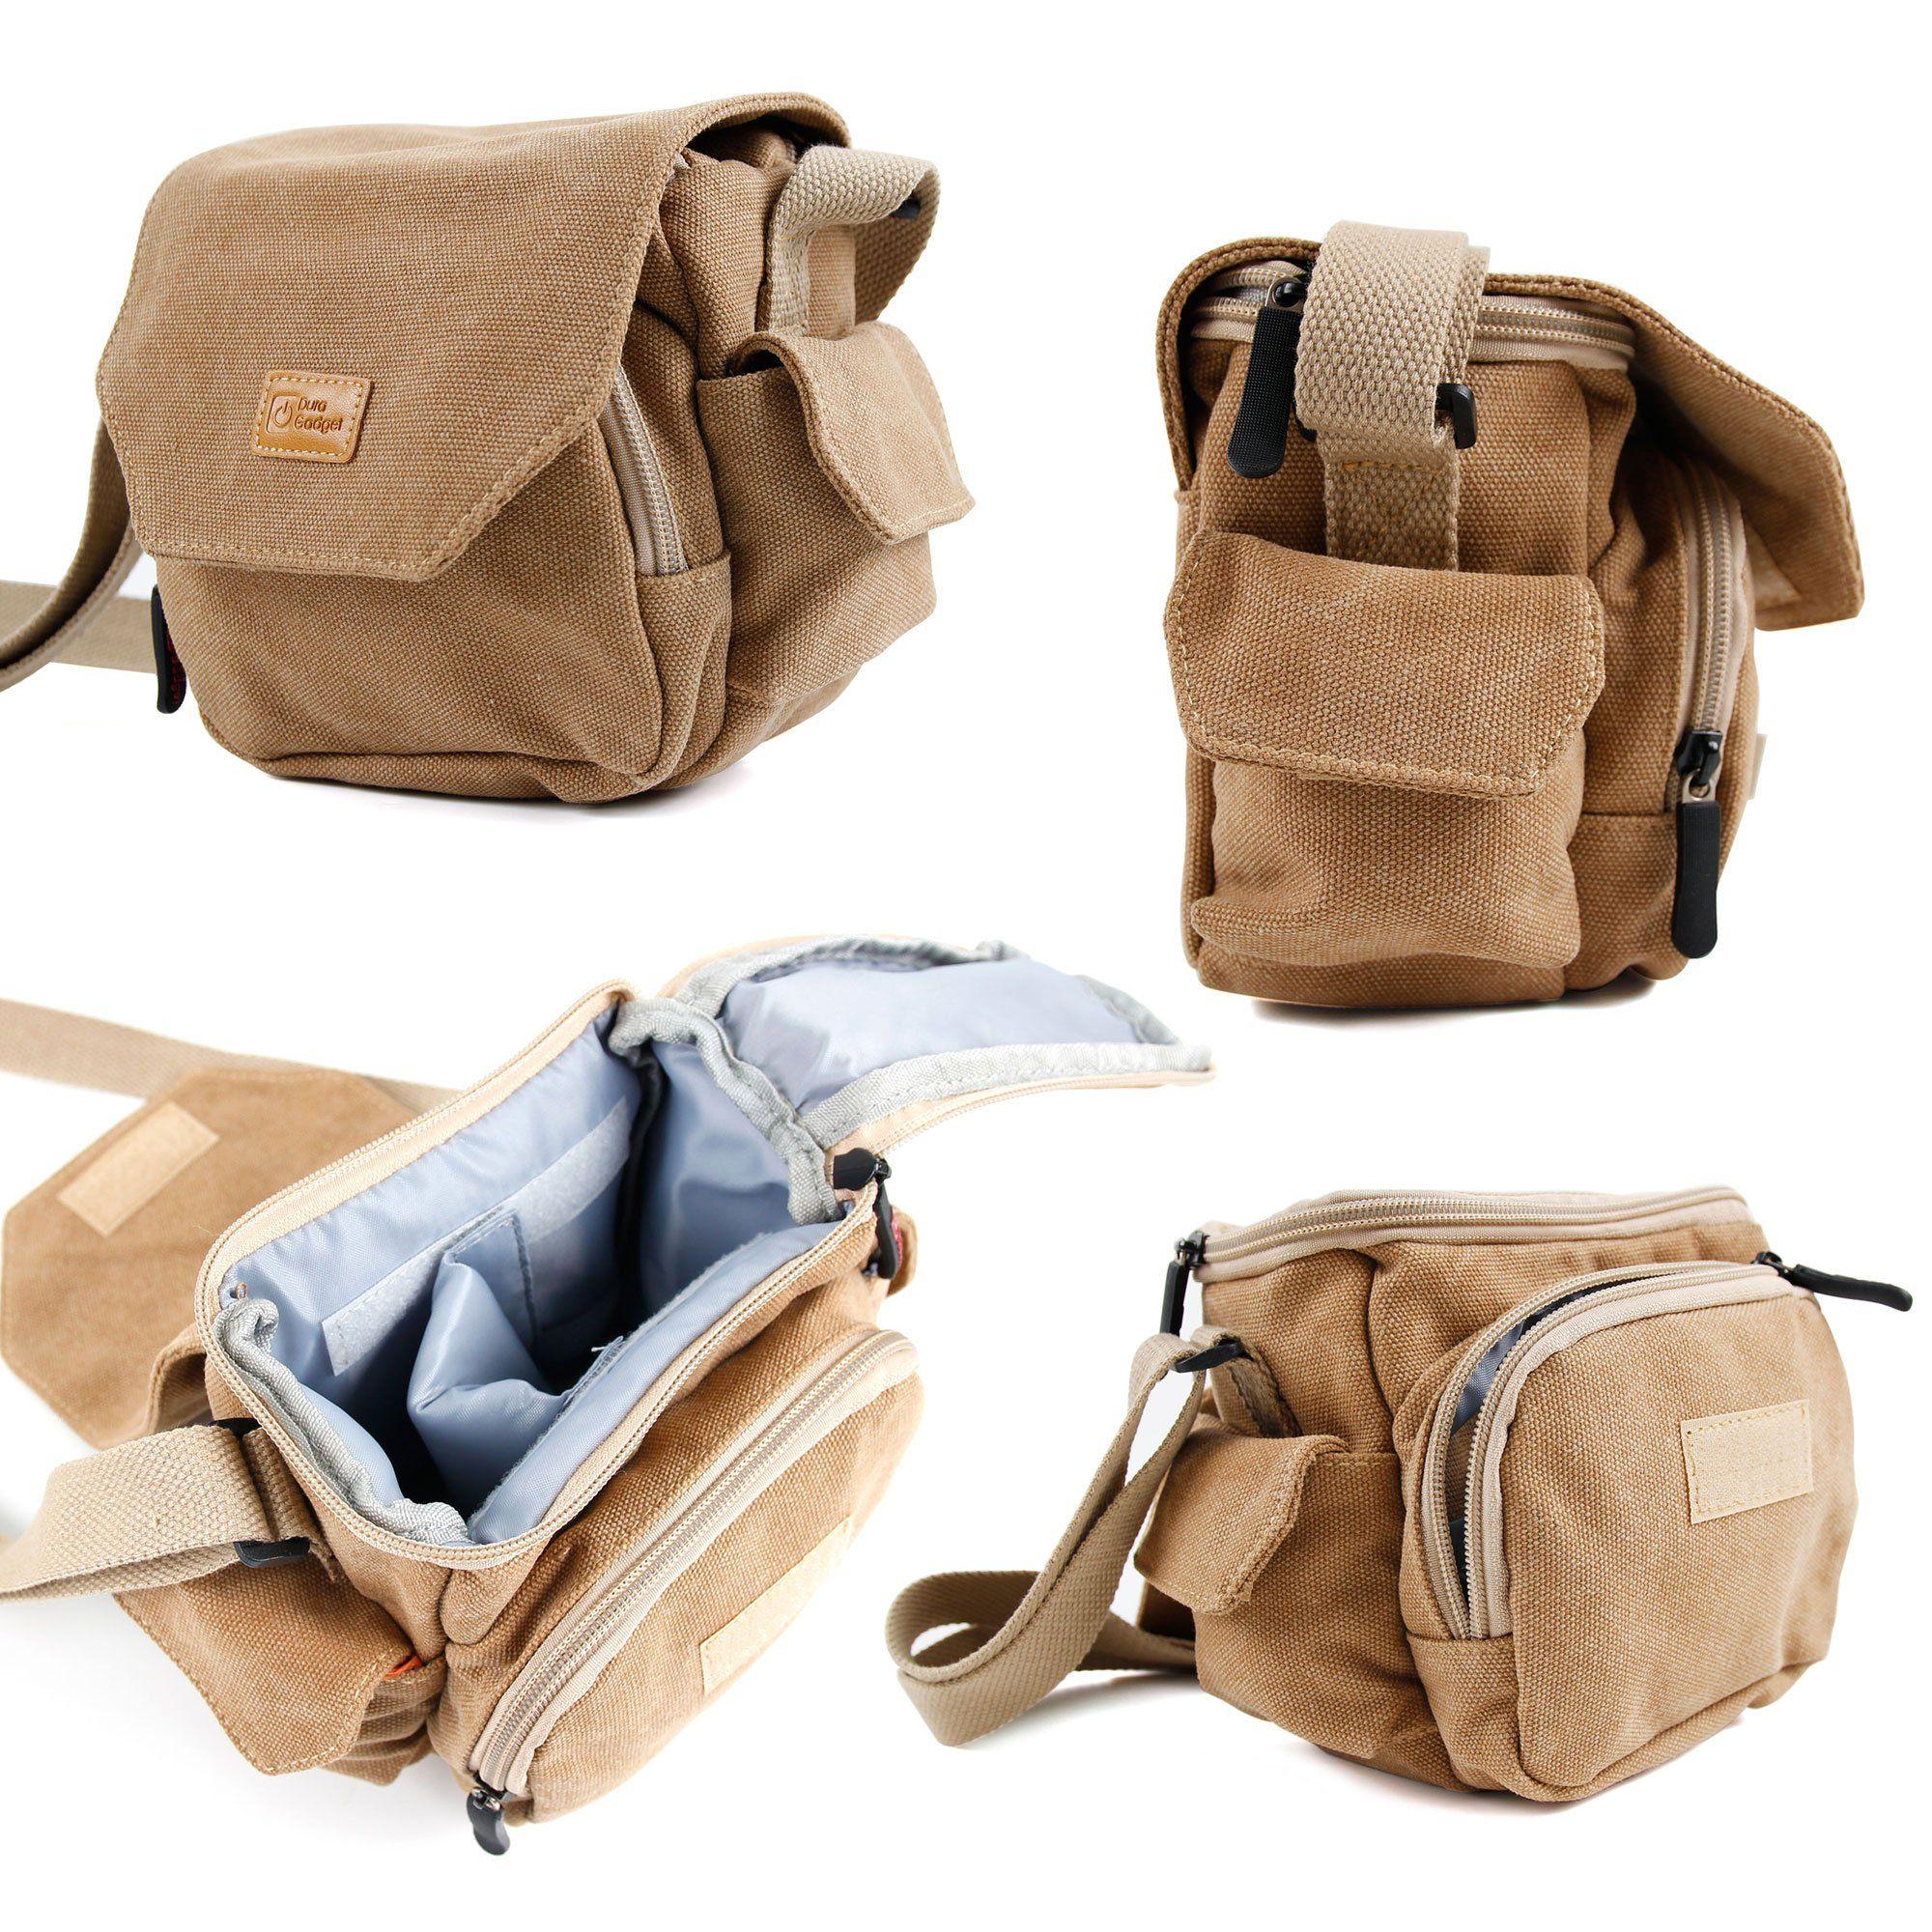 7c634187b881 DURAGADGET Tan Brown Medium Sized Canvas Carry Bag for New Olympus ...